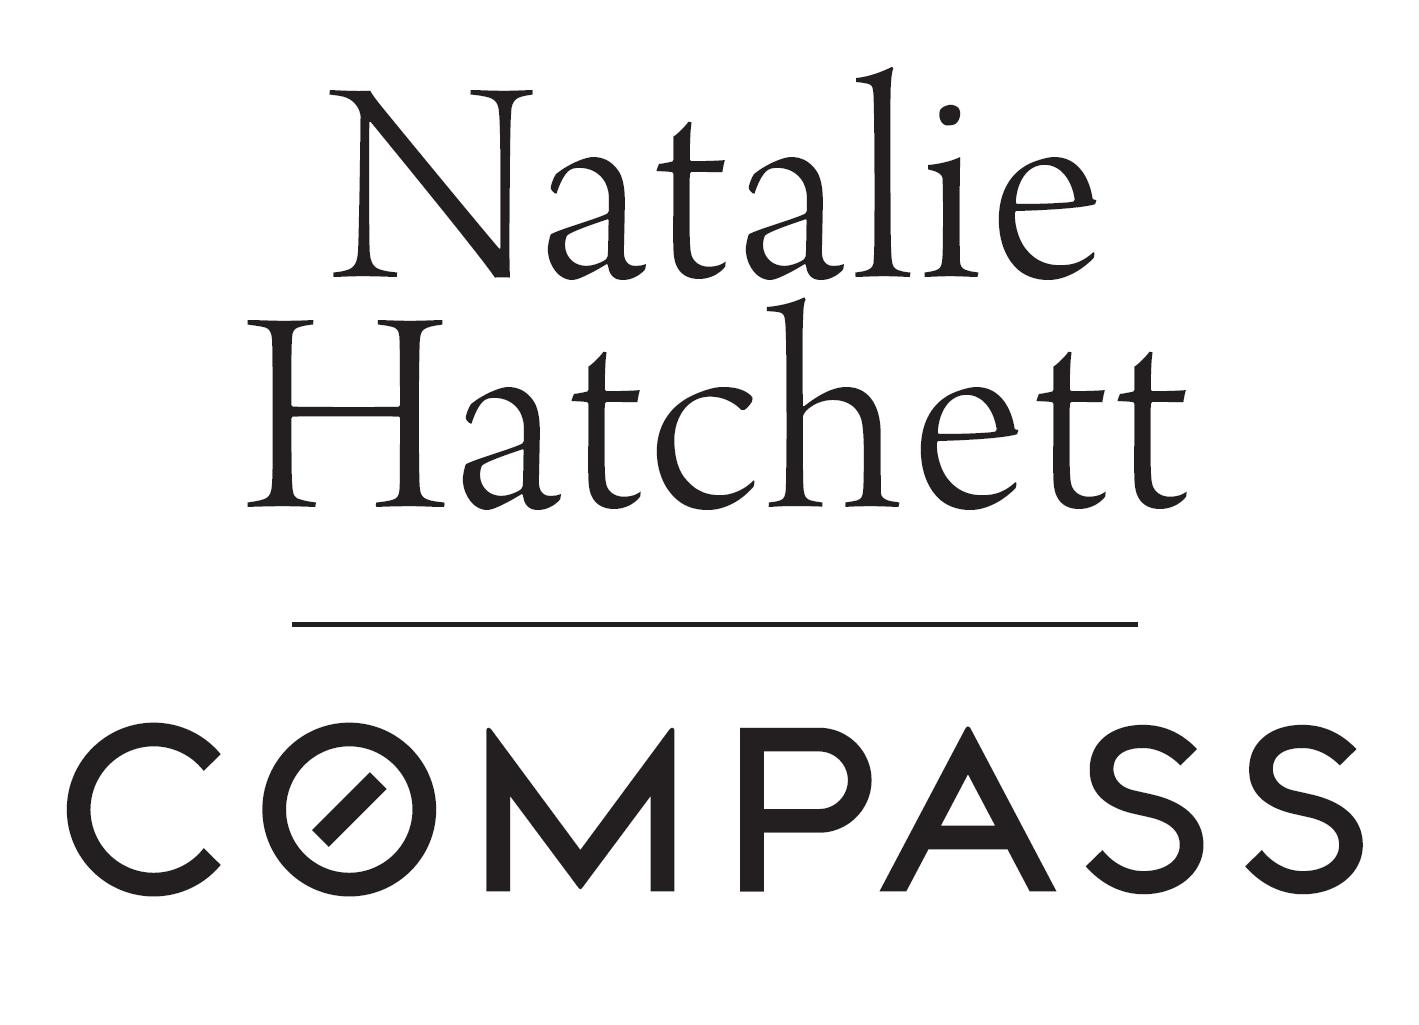 Natalie logo